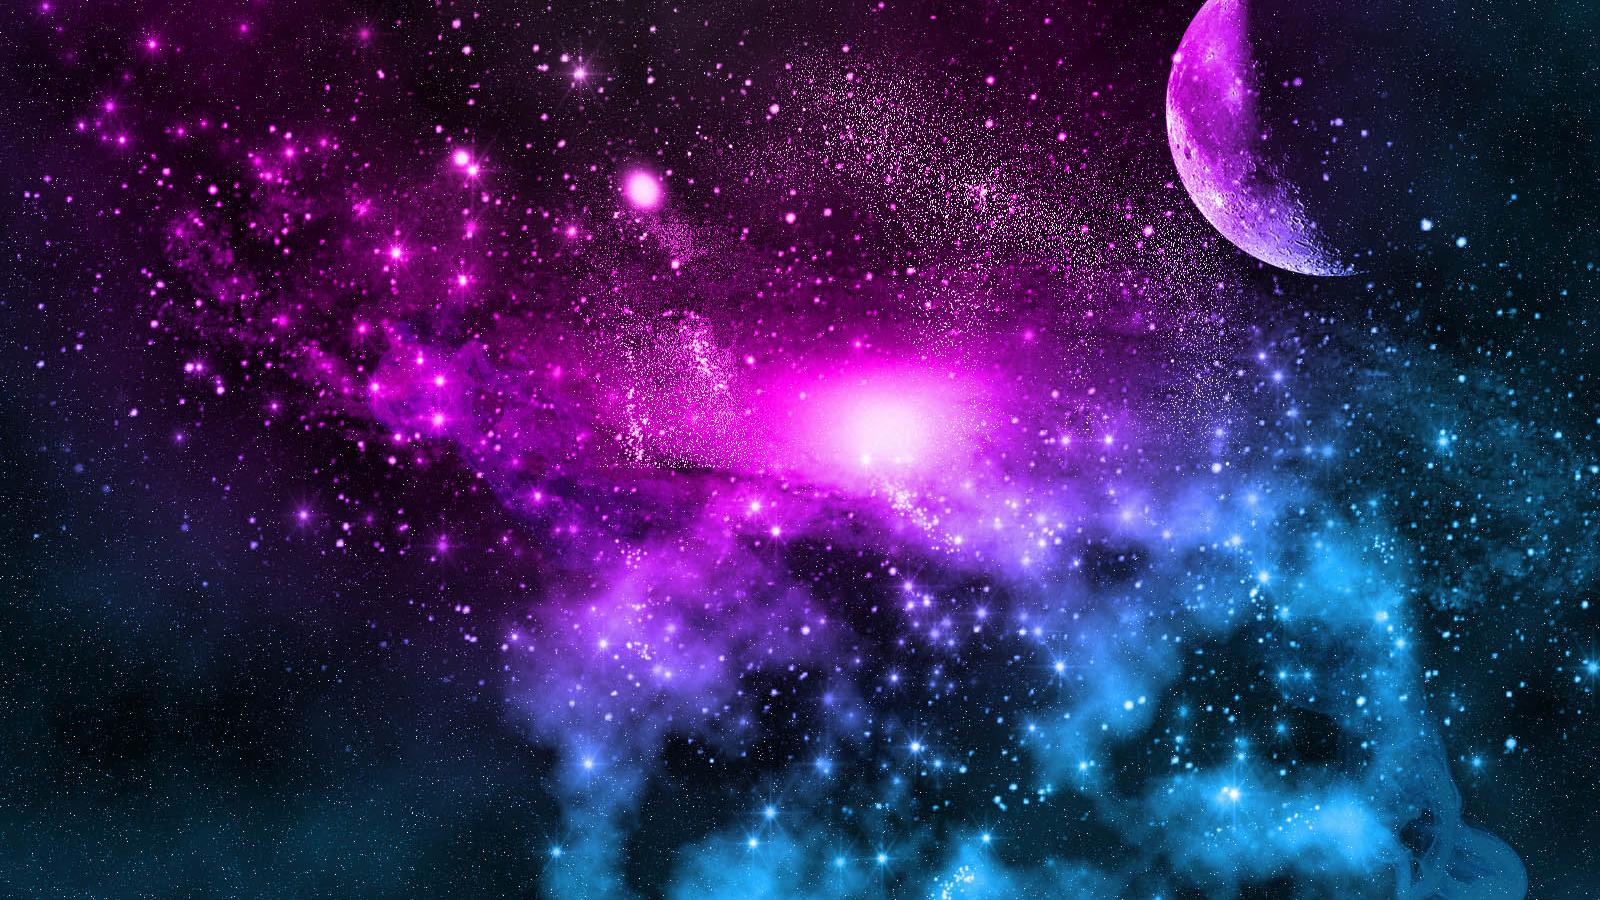 Free download Beautiful Moon Galaxy Wallpaper Hd 1600x1000 ...